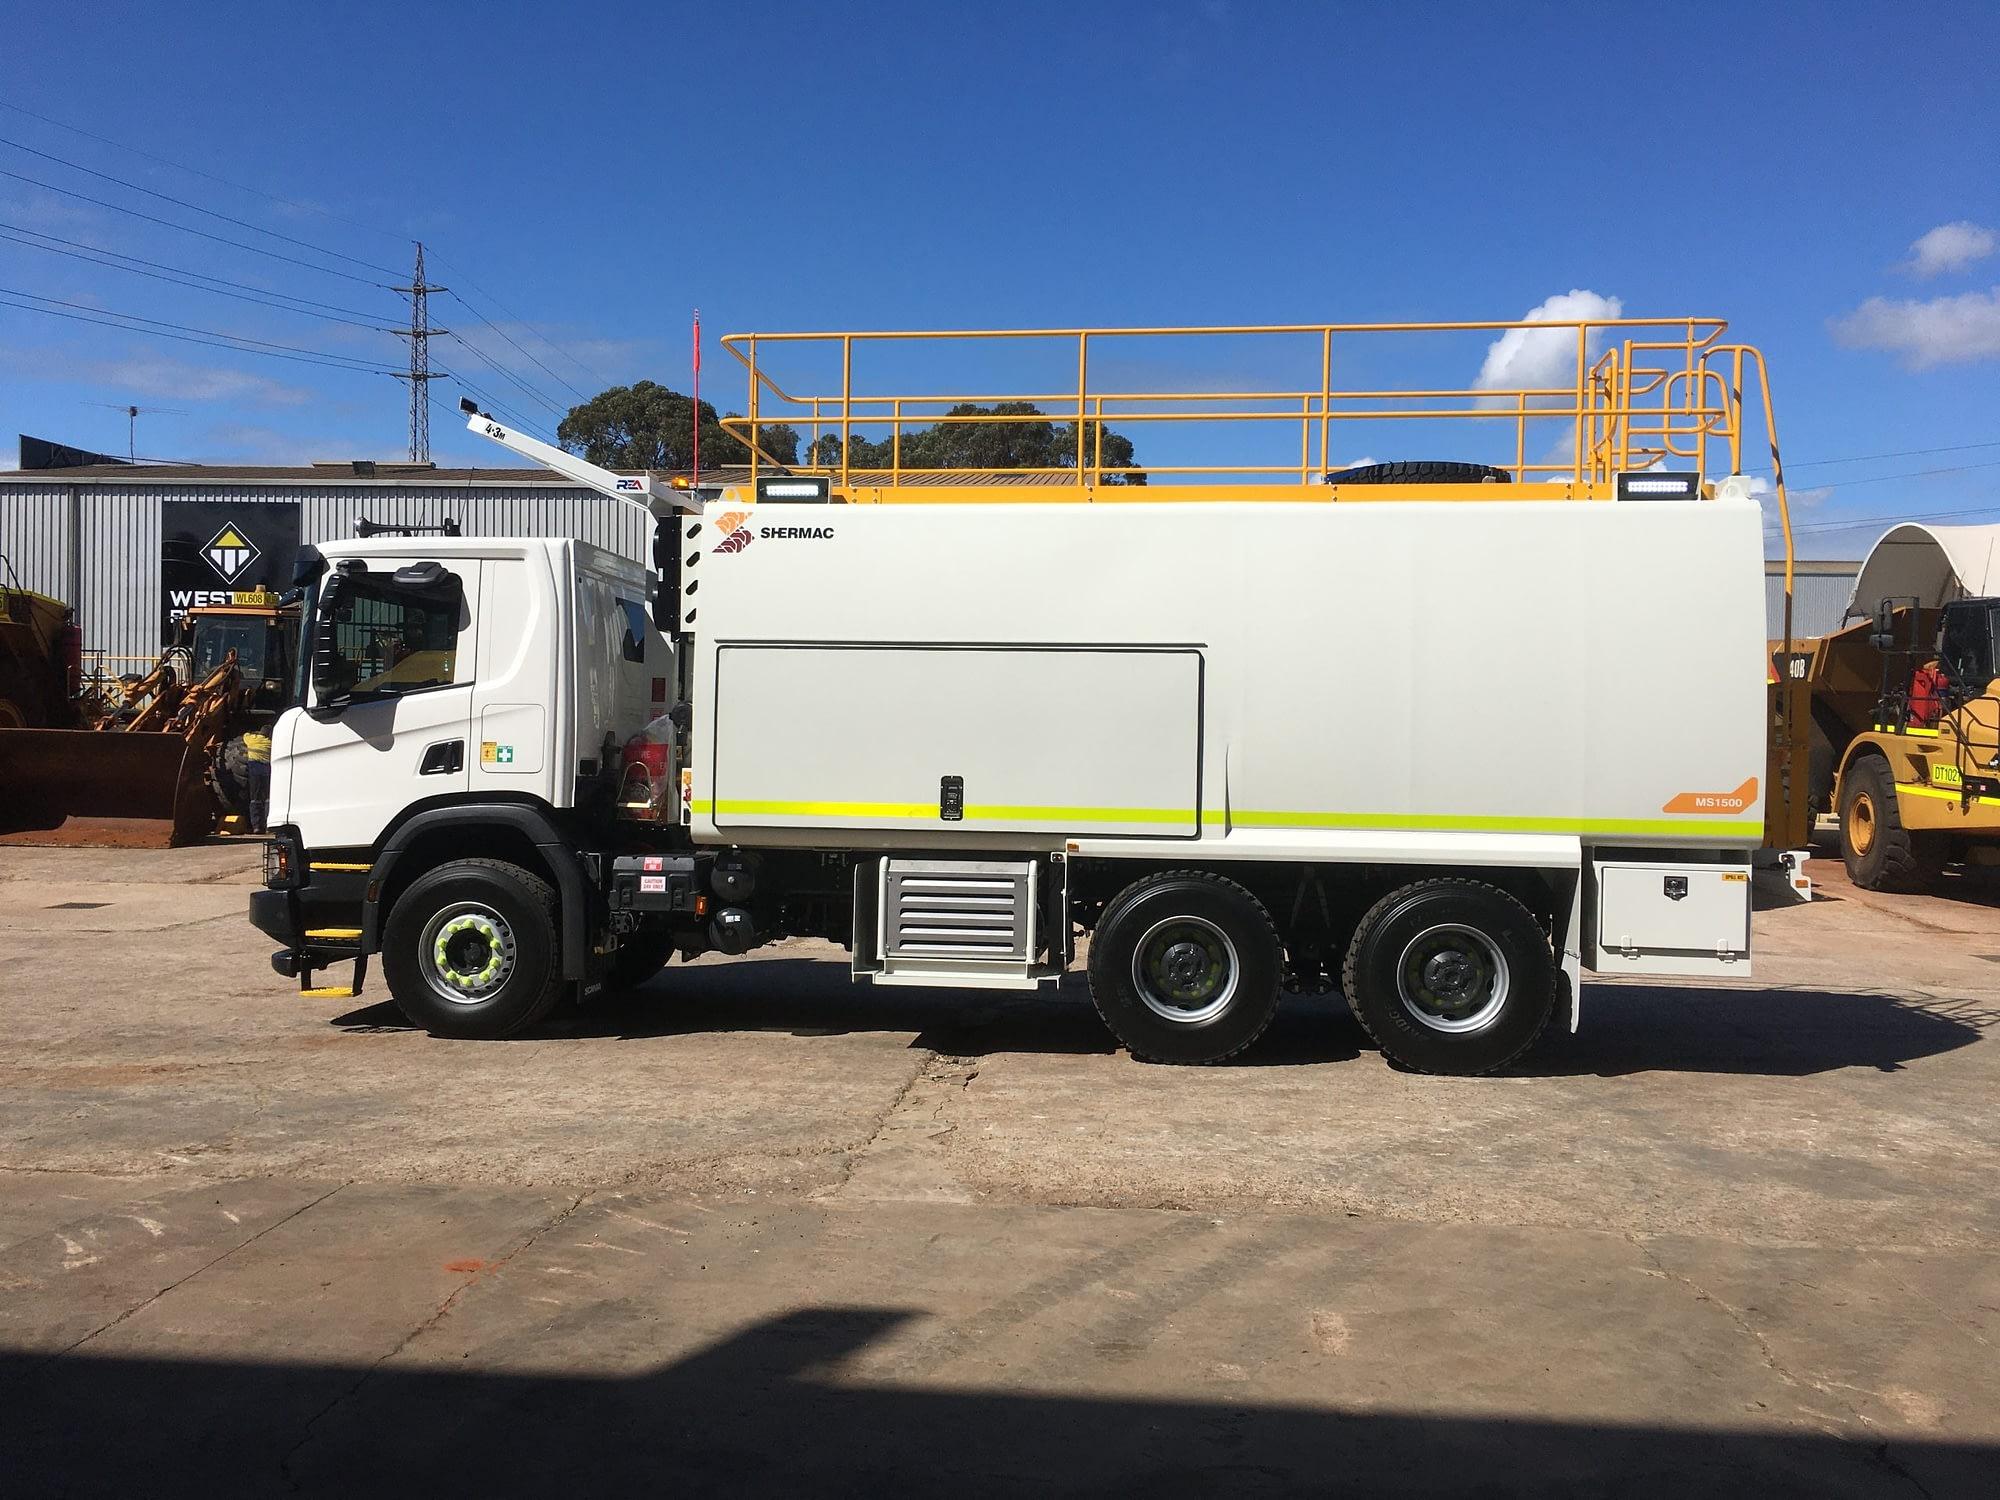 Scania Heavy Duty 6 Wheel Service Truck - For Hire